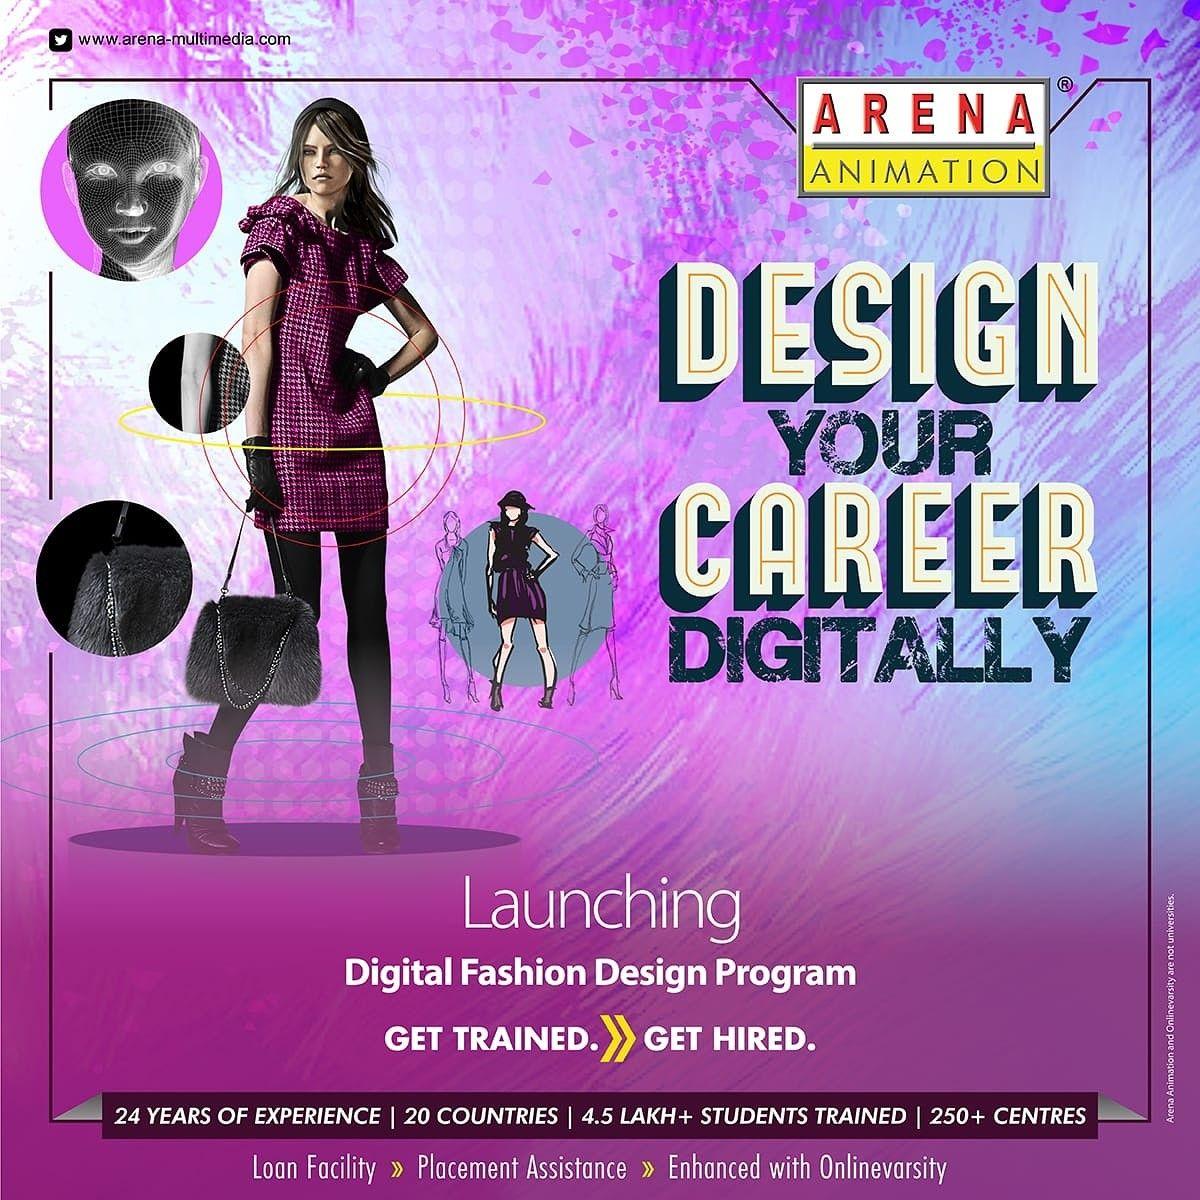 Computer Training For Animation In Patna In 2020 Digital Fashion Design Design Program Animation Design